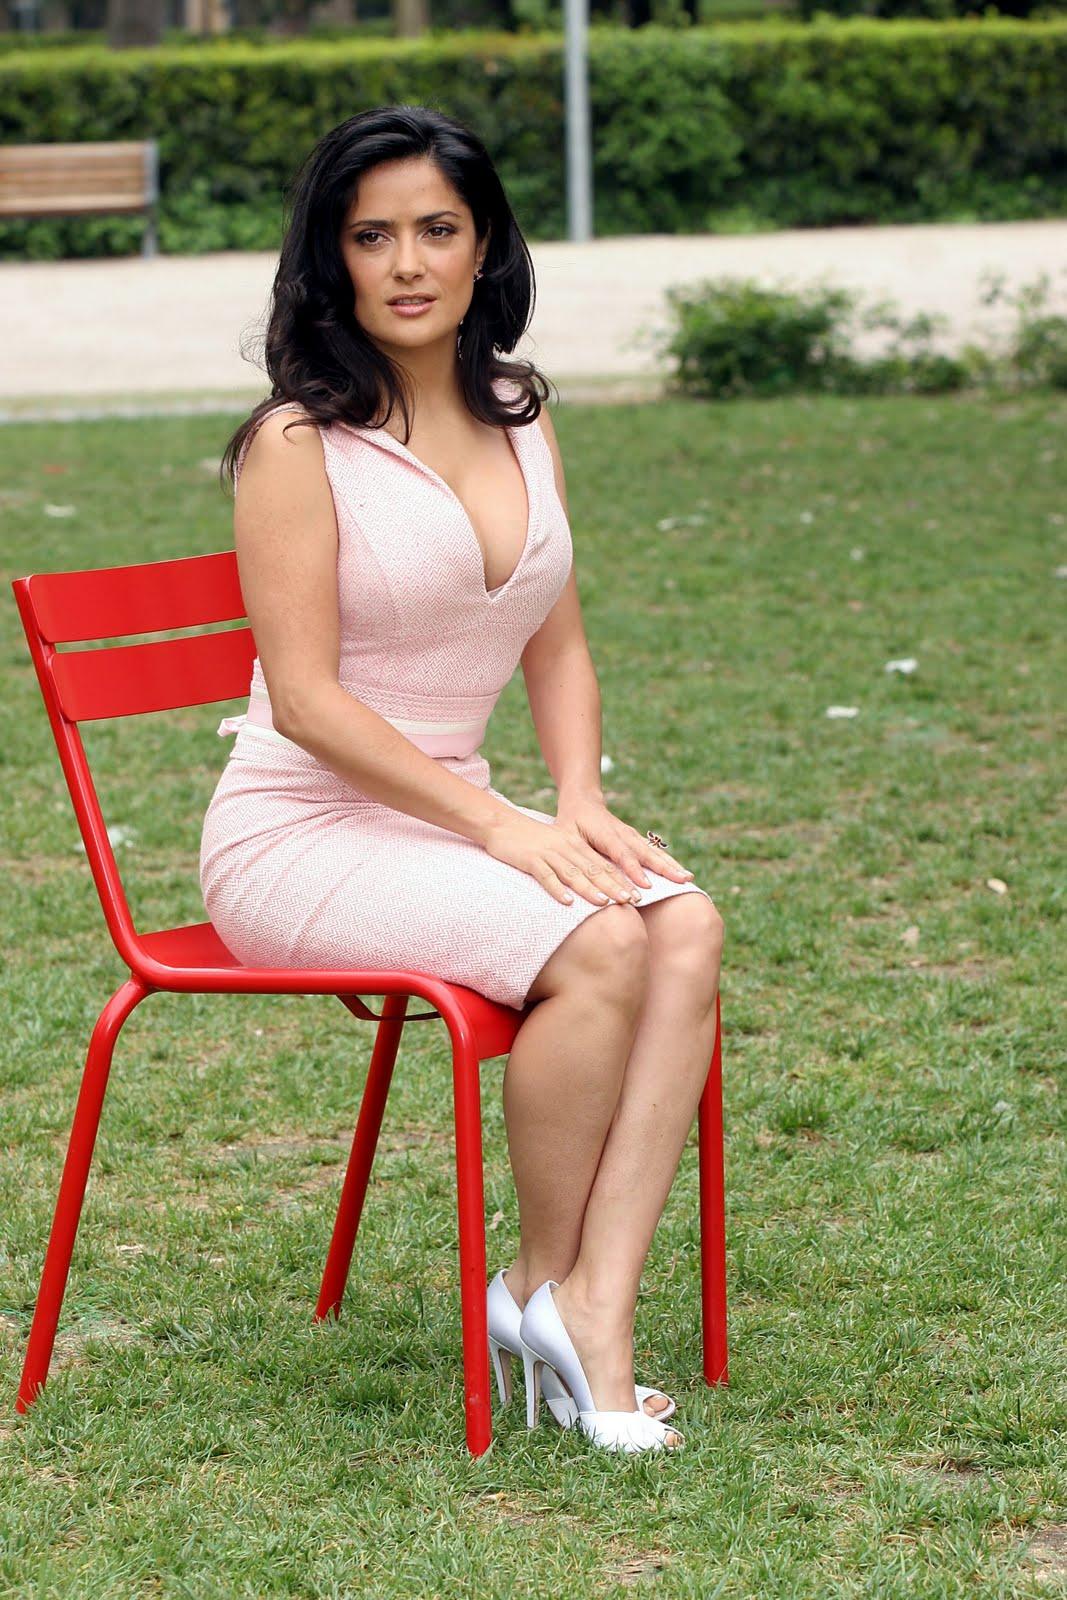 Salma Hayek posa topless para Allure Magazine Variety  - imagenes de salma hayek sin ropa